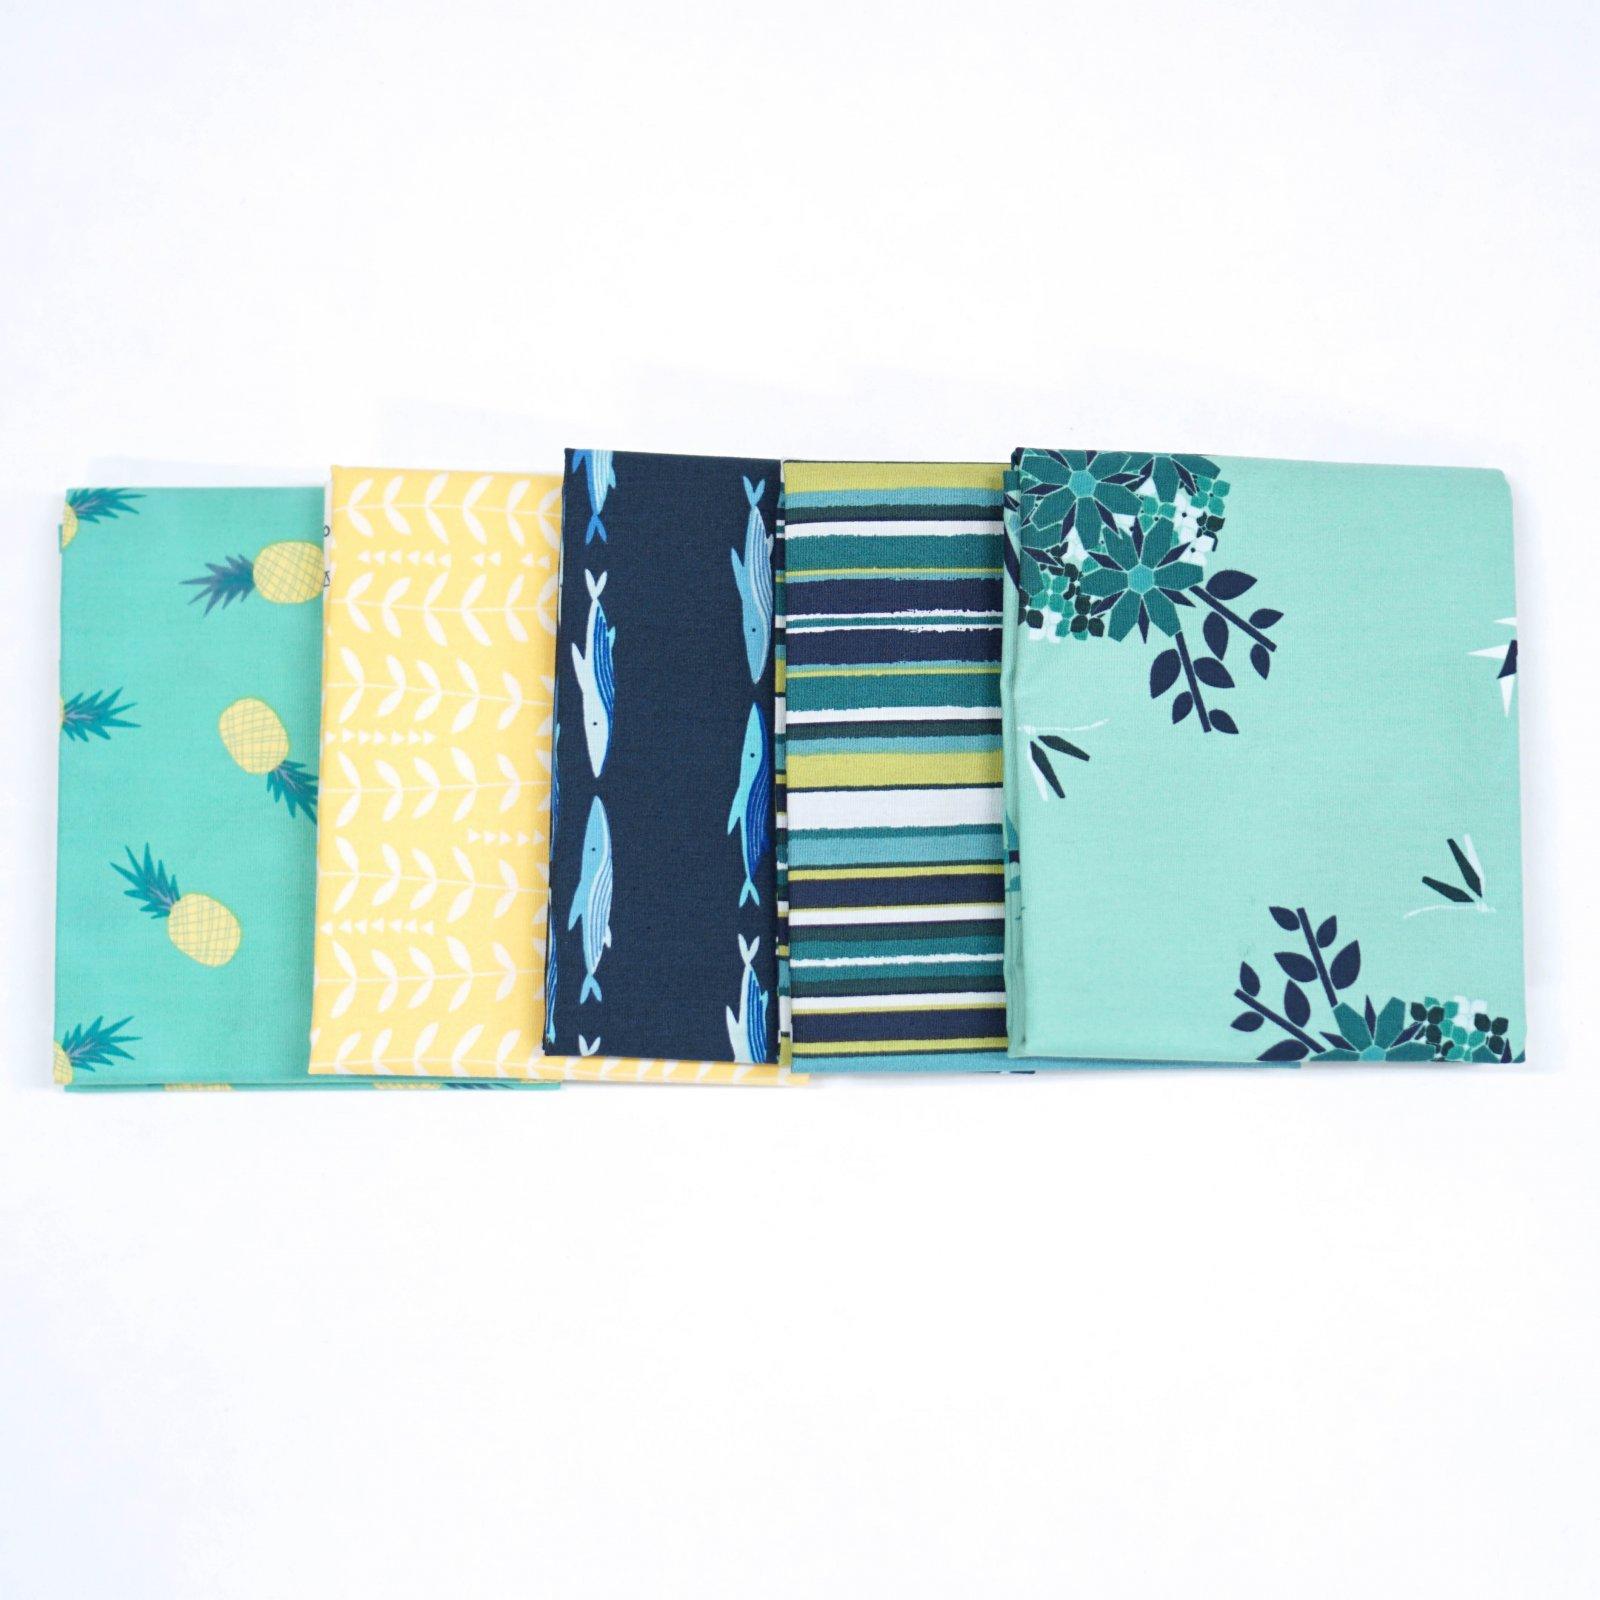 Summer Vibes- Crosscut Sewing Custom Bundle - (5) Half Yards